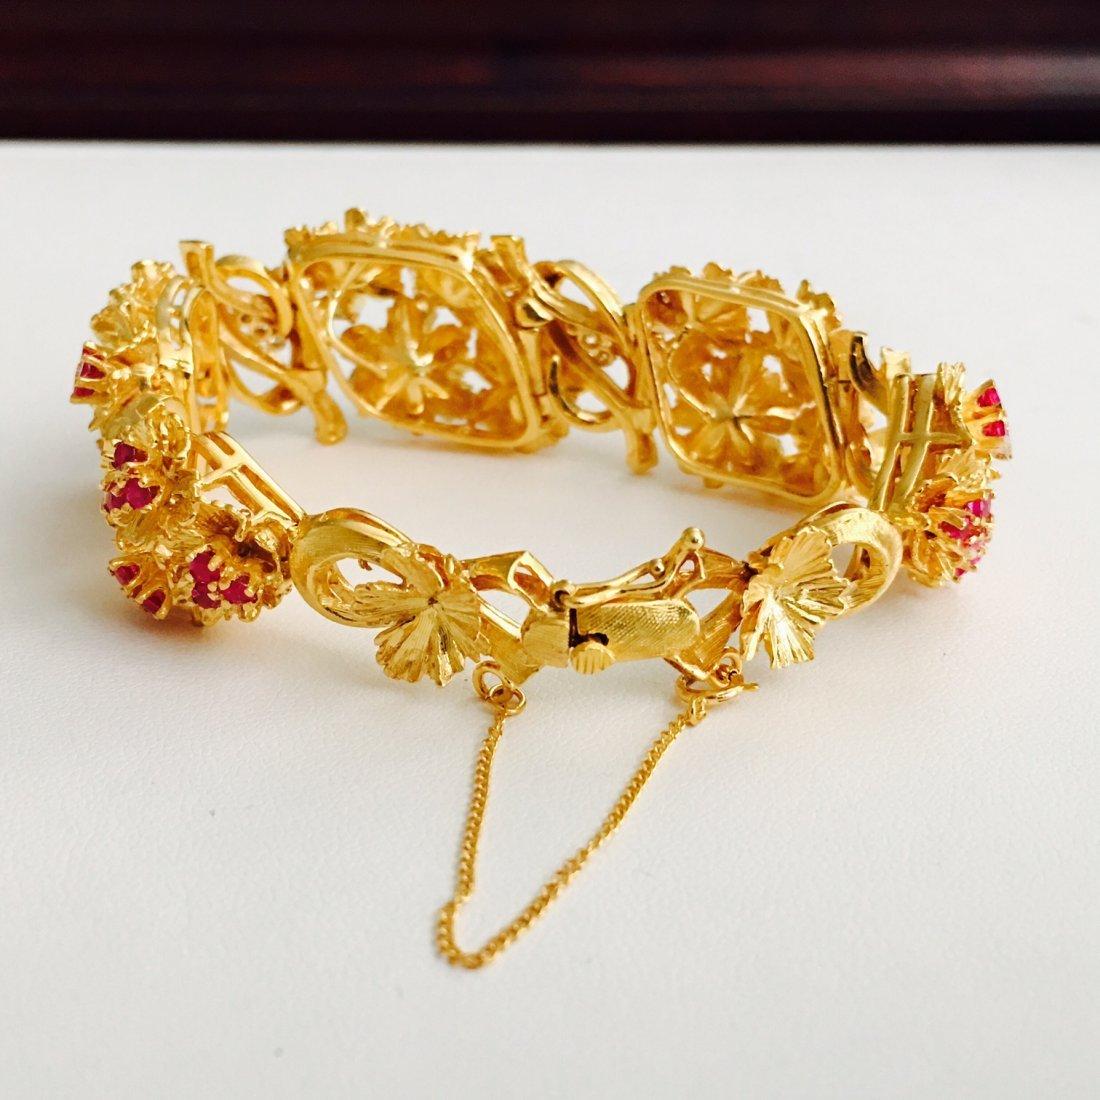 Vinatge 18K Gold 7 CARAT Burma Ruby Diamond Bracelet - 3